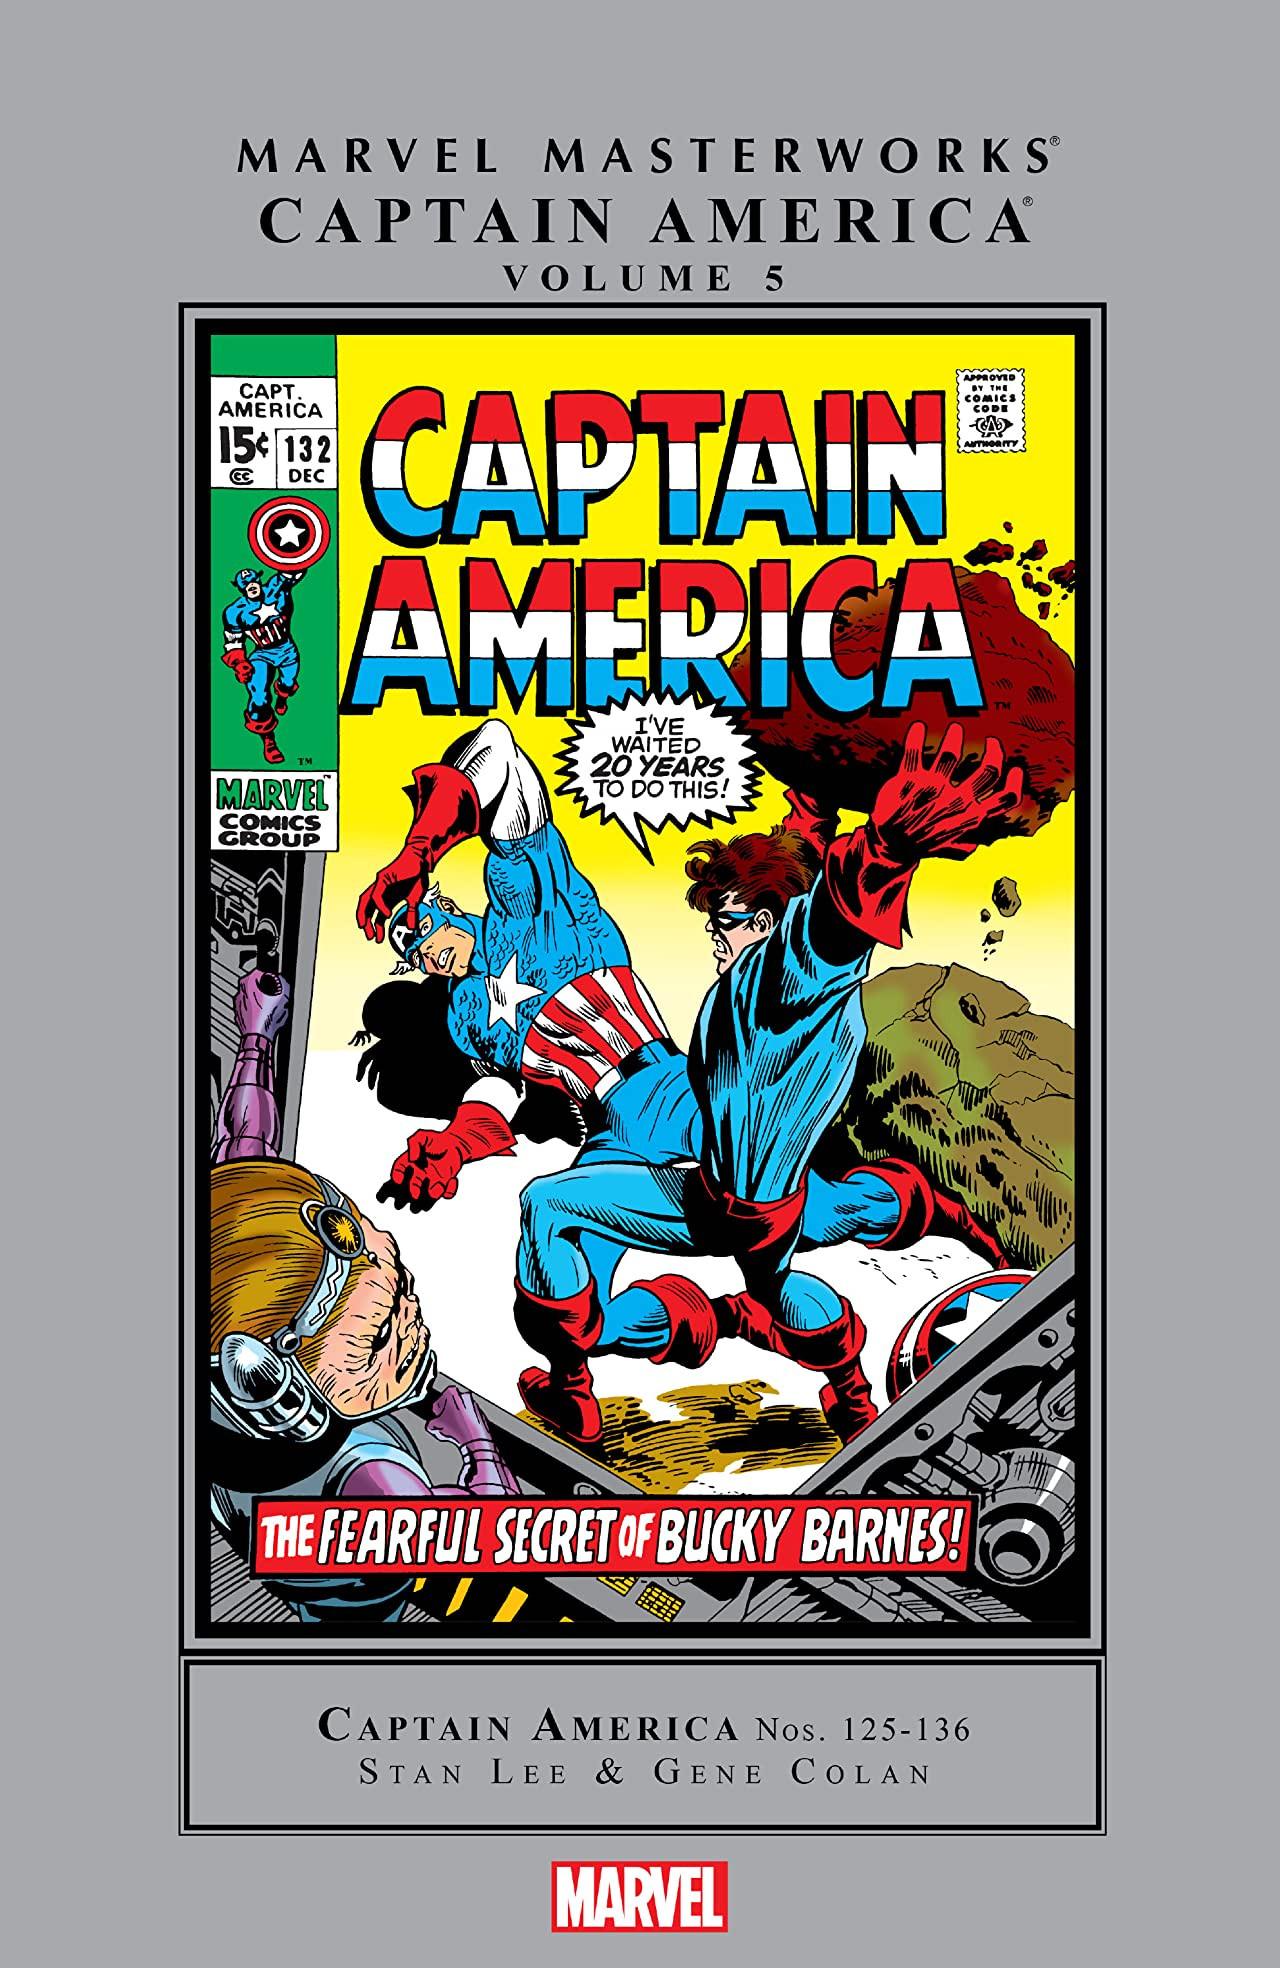 Marvel Masterworks: Captain America Vol 1 5